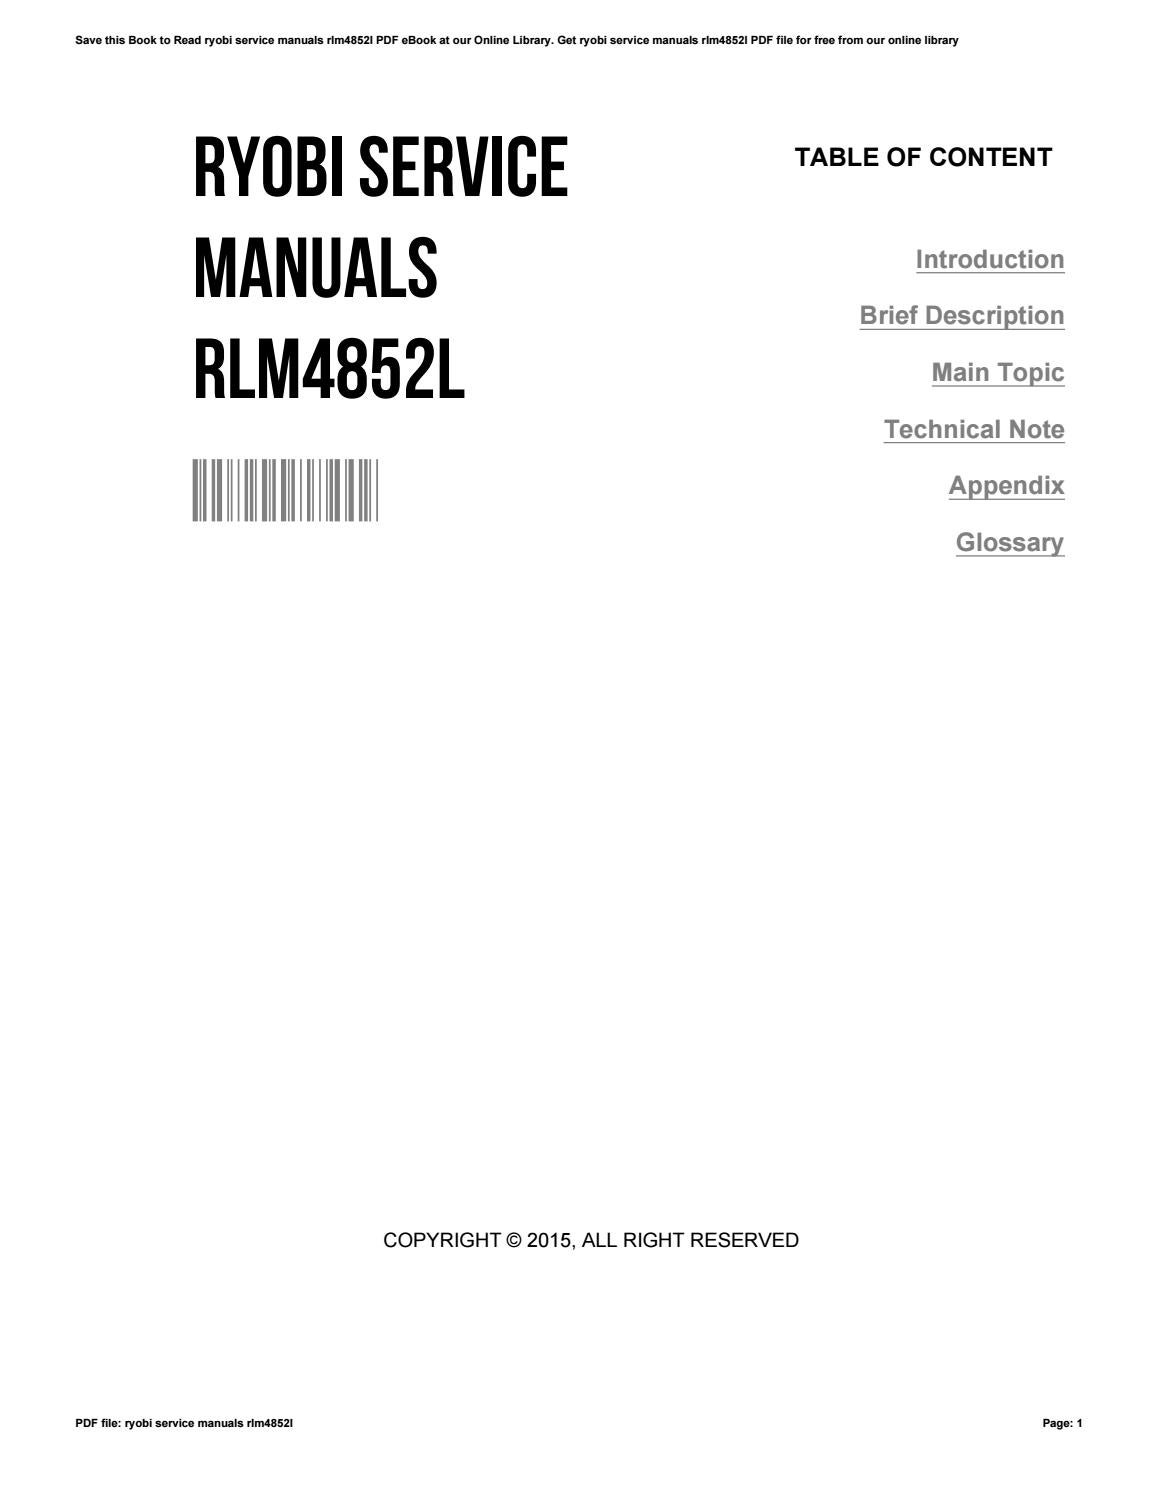 Ryobi service manuals rlm4852l by StephanieCharlebois1459